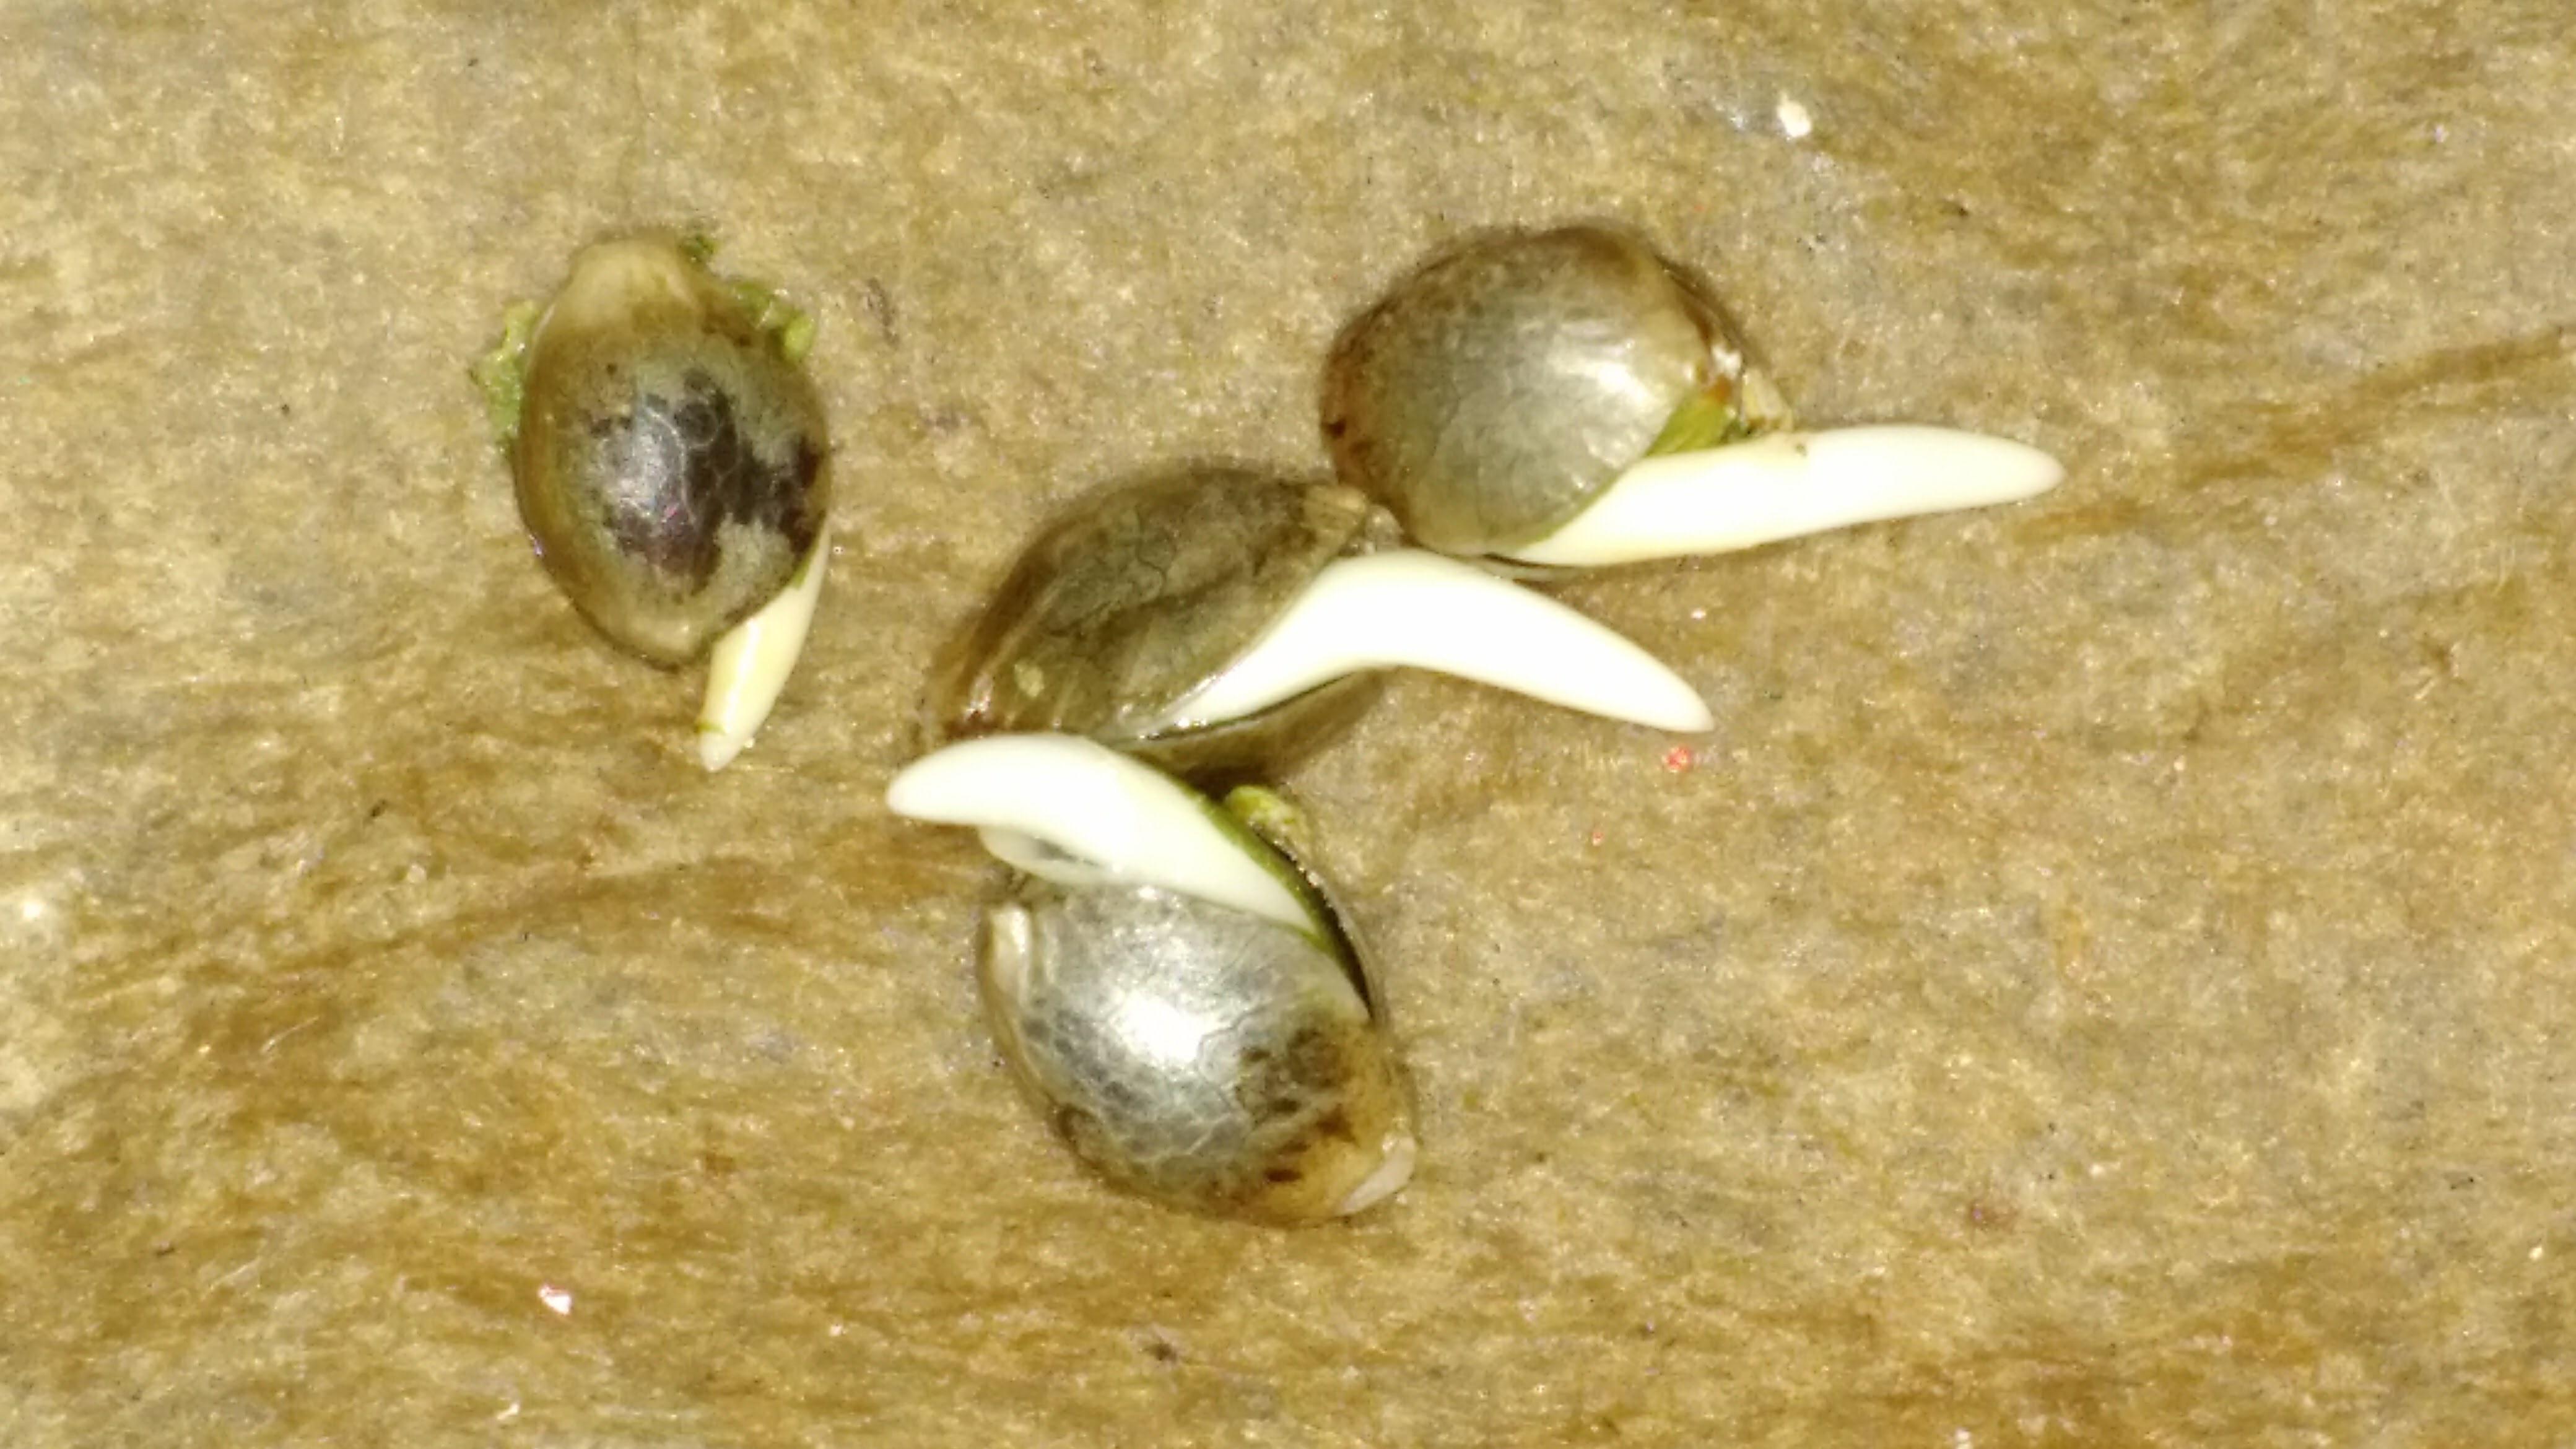 Germinating Cannabis Seeds - Dab Canada Compassion Society